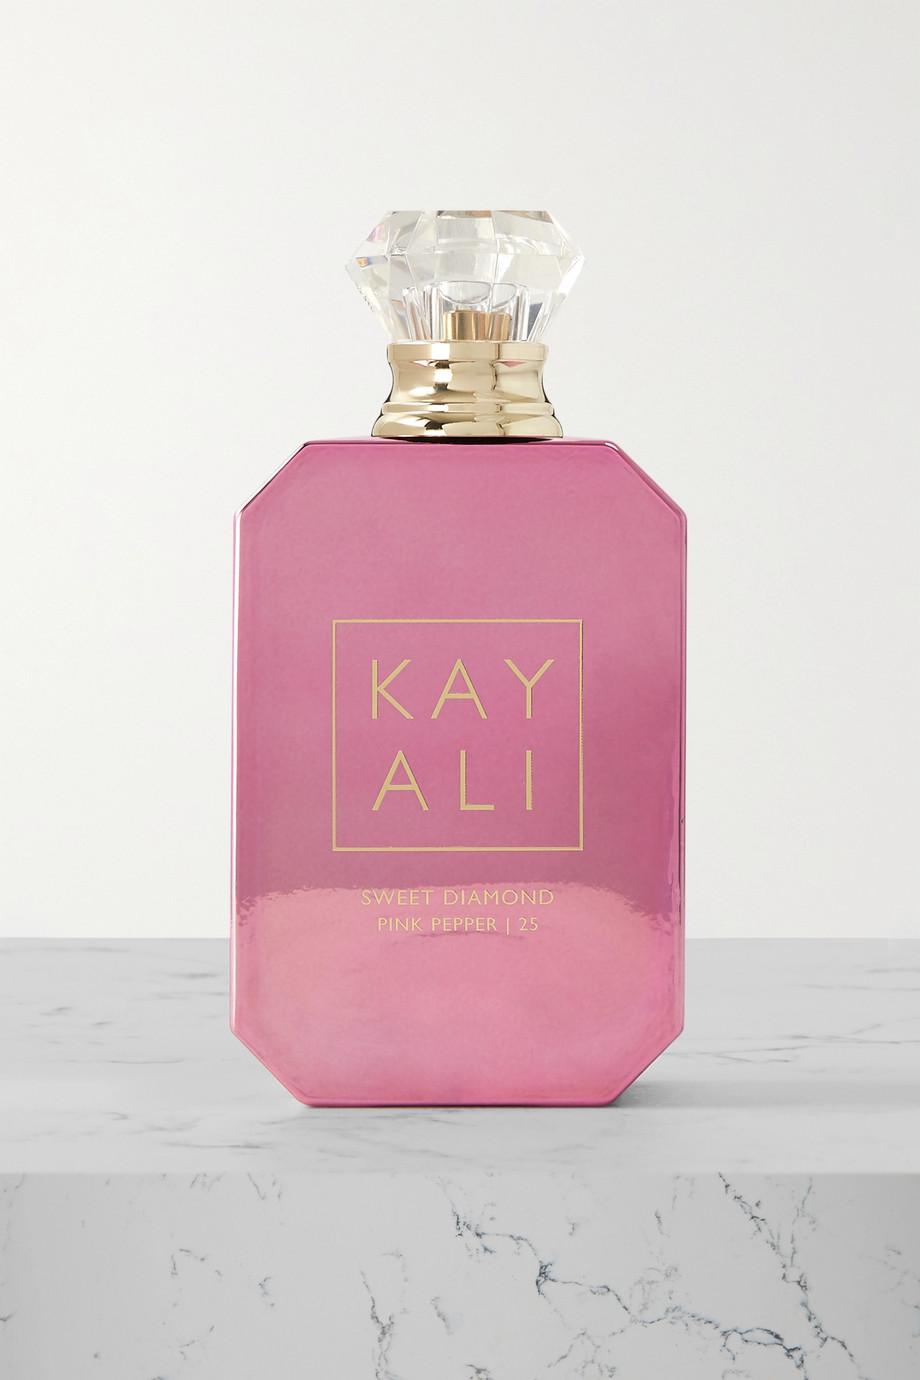 Huda Beauty Kayali Eau de Parfum - Sweet Diamond Pink Pepper 25, 100ml